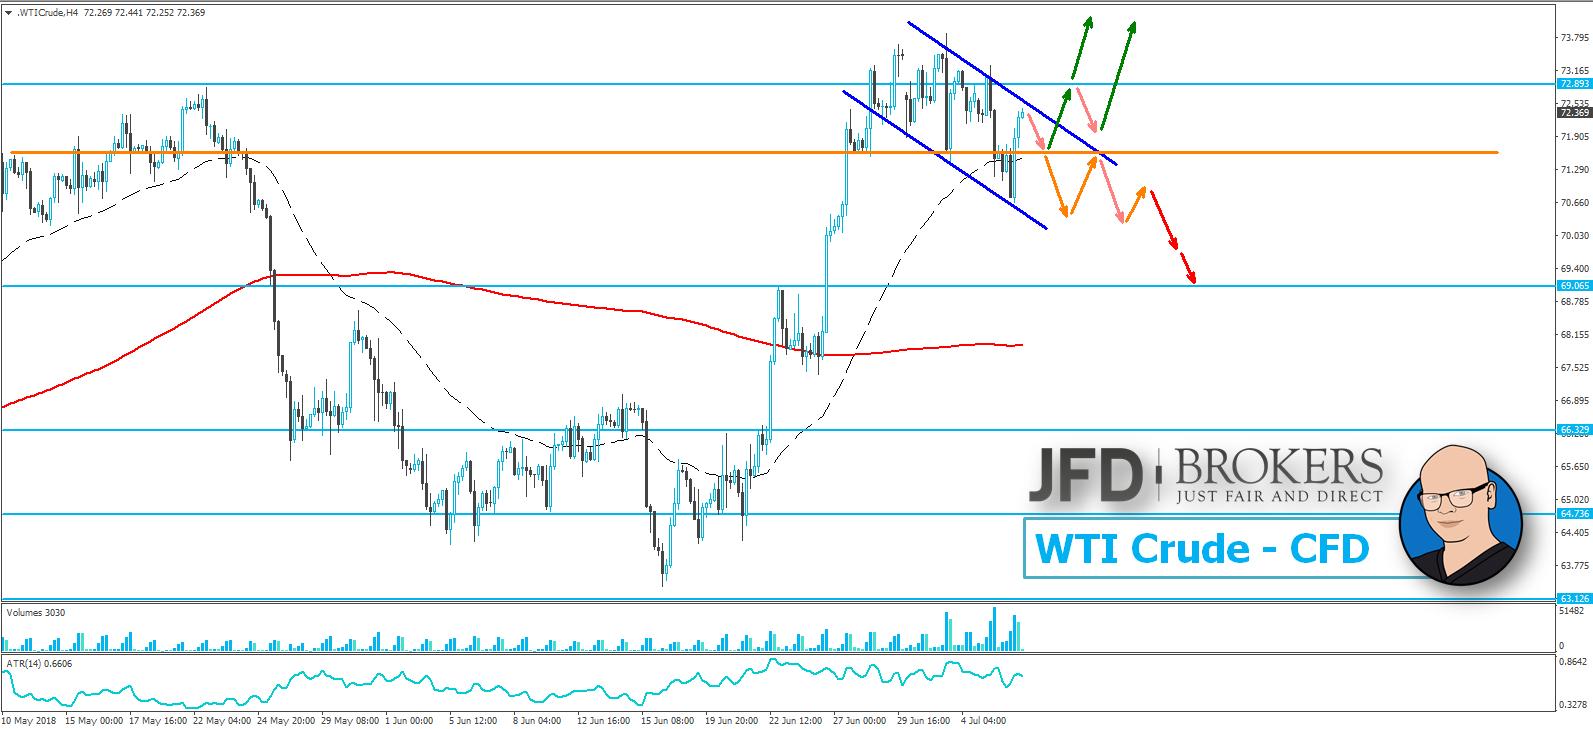 JFD-Wochenausblick-EUR-USD-GBP-USD-DAX-und-WTI-09-07-2018-13-07-2018-Kommentar-JFD-Brokers-GodmodeTrader.de-4